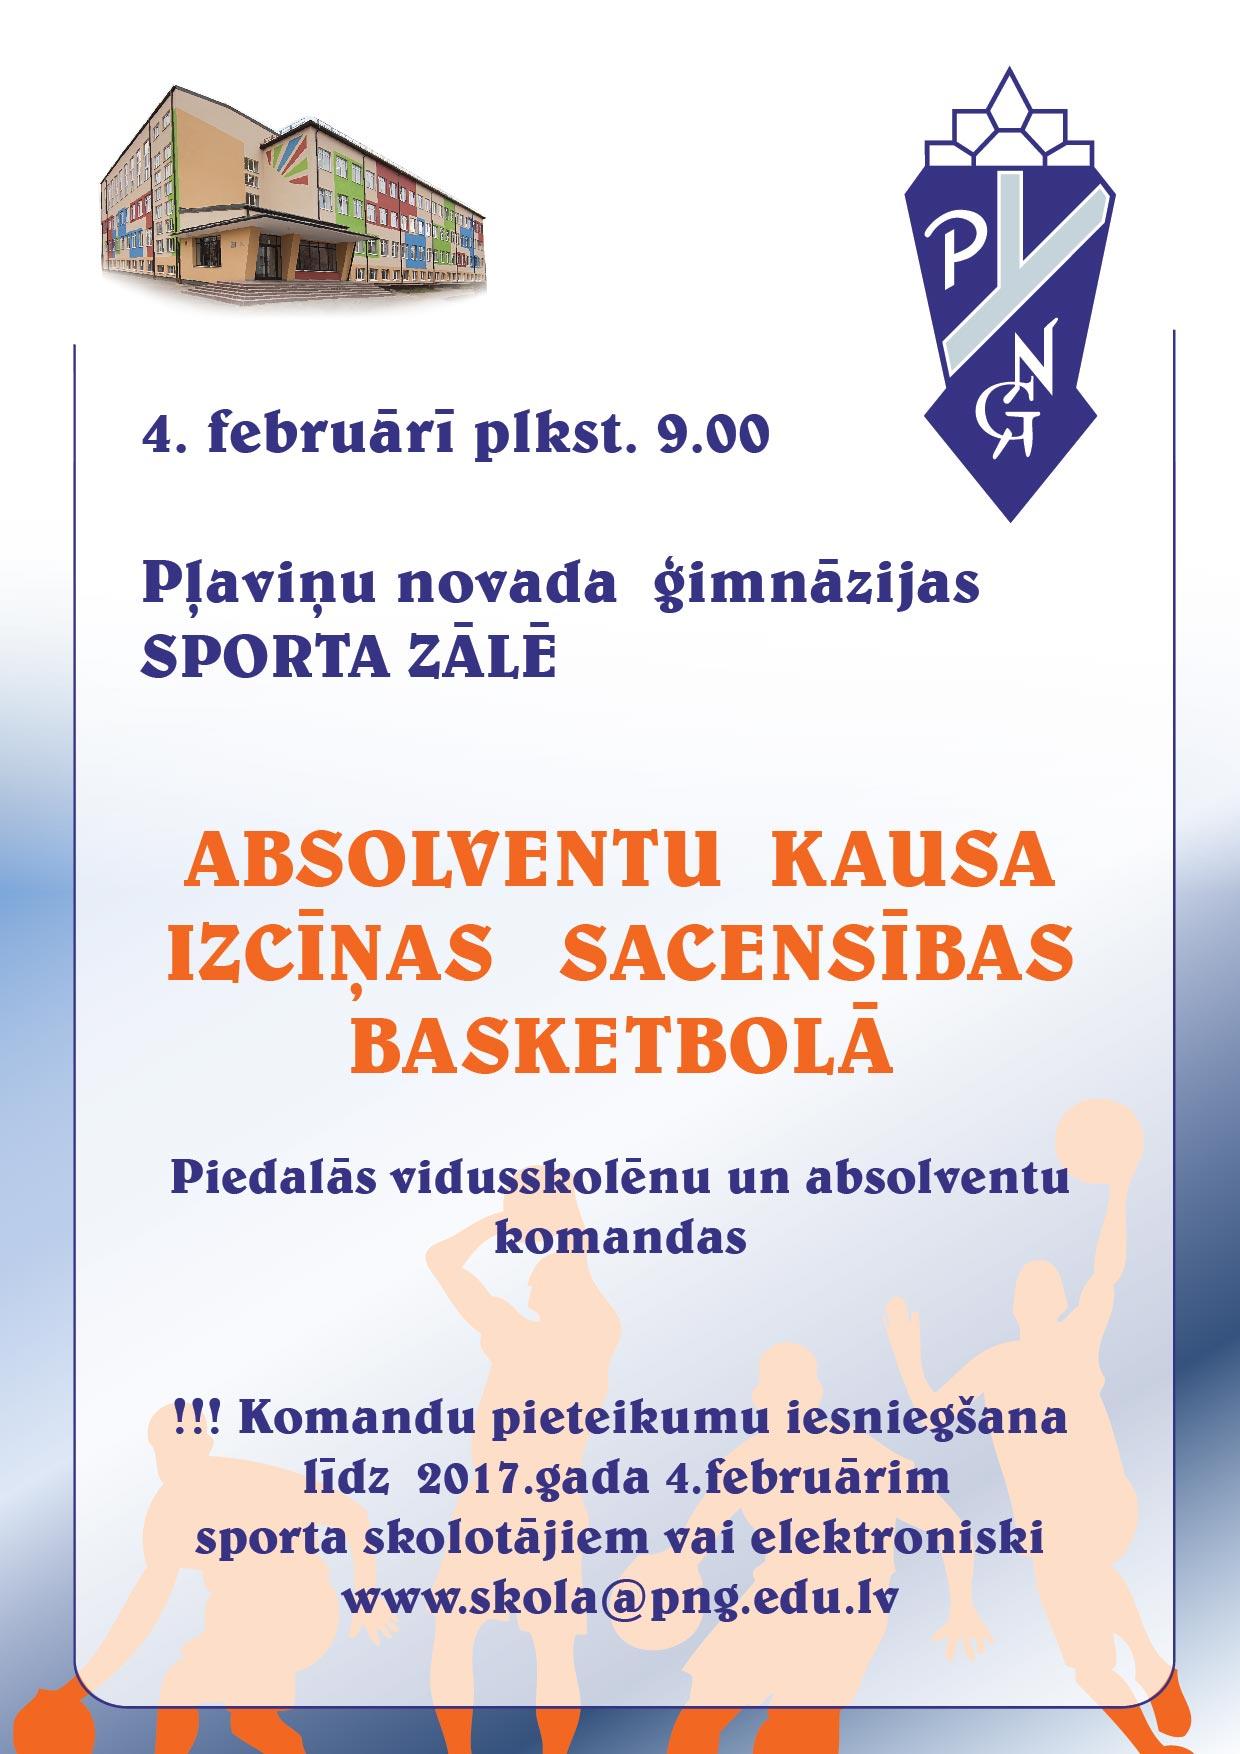 afisa_absolventu kauss_2017